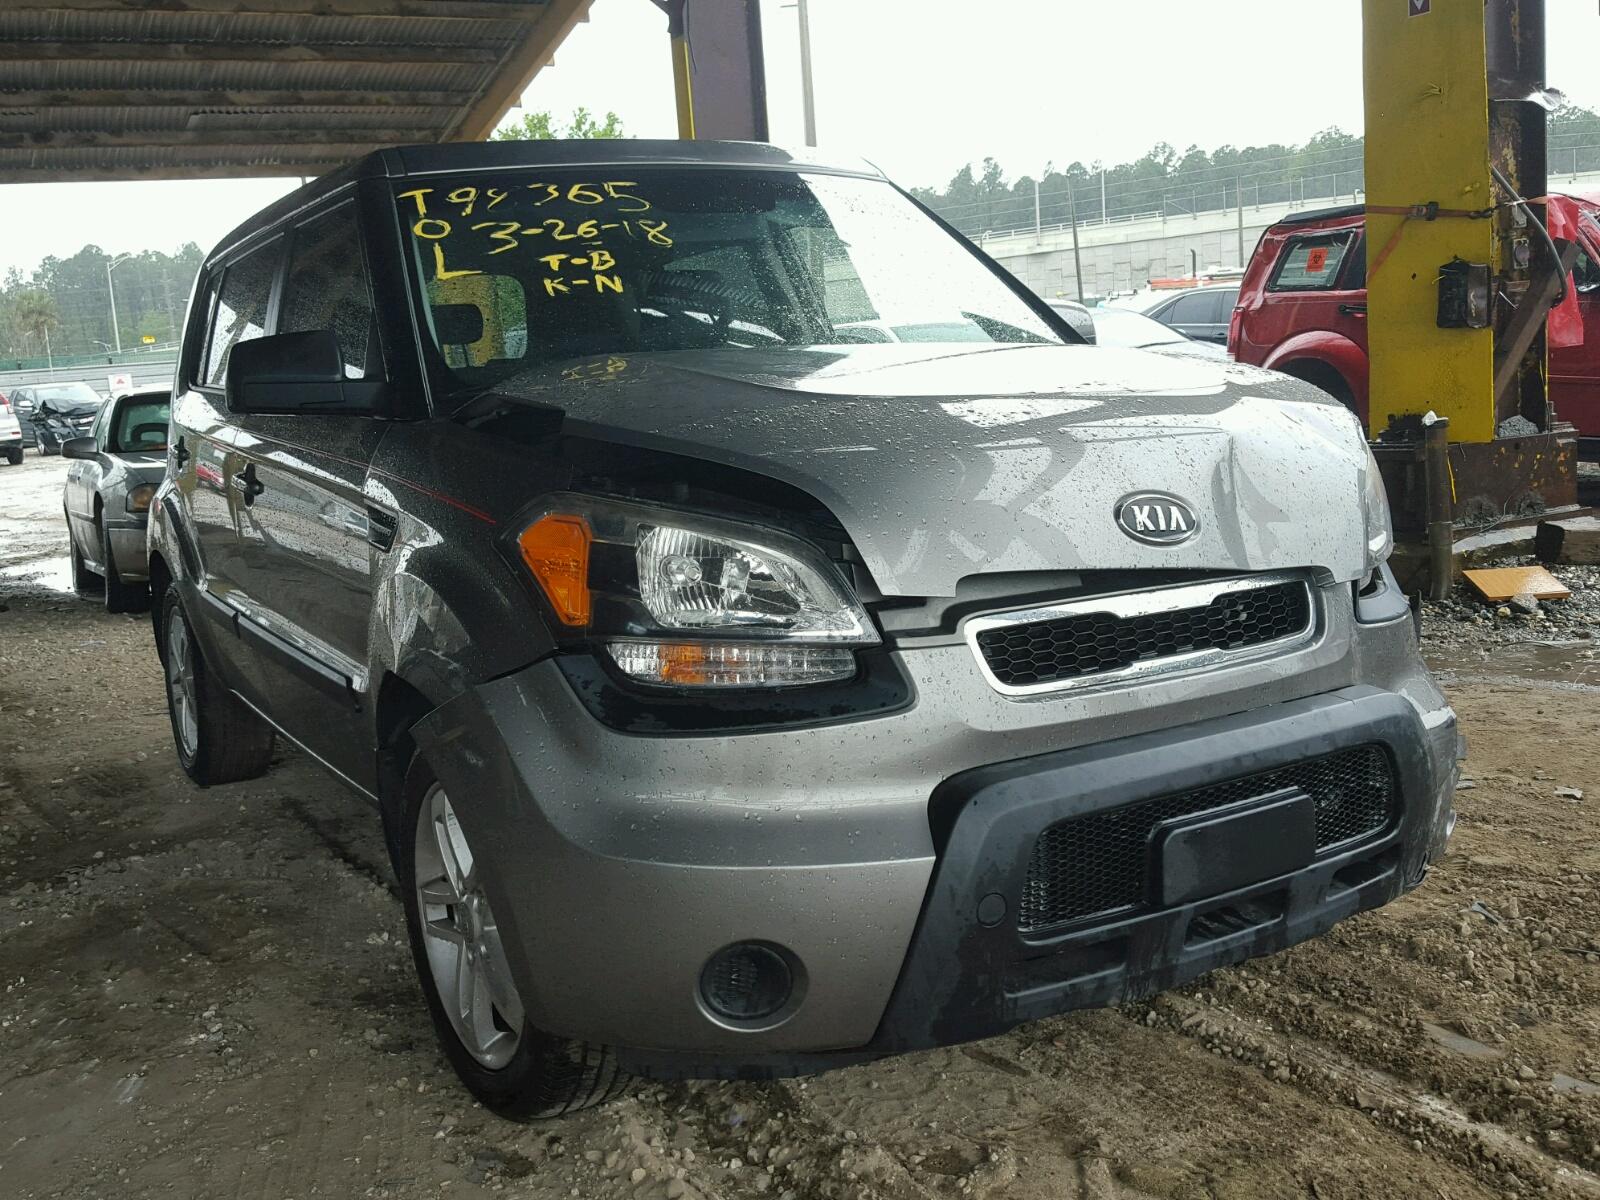 en title la of auctions carfinder baton online brown kia sale copart auto in rouge soul lot salvage on vehicle